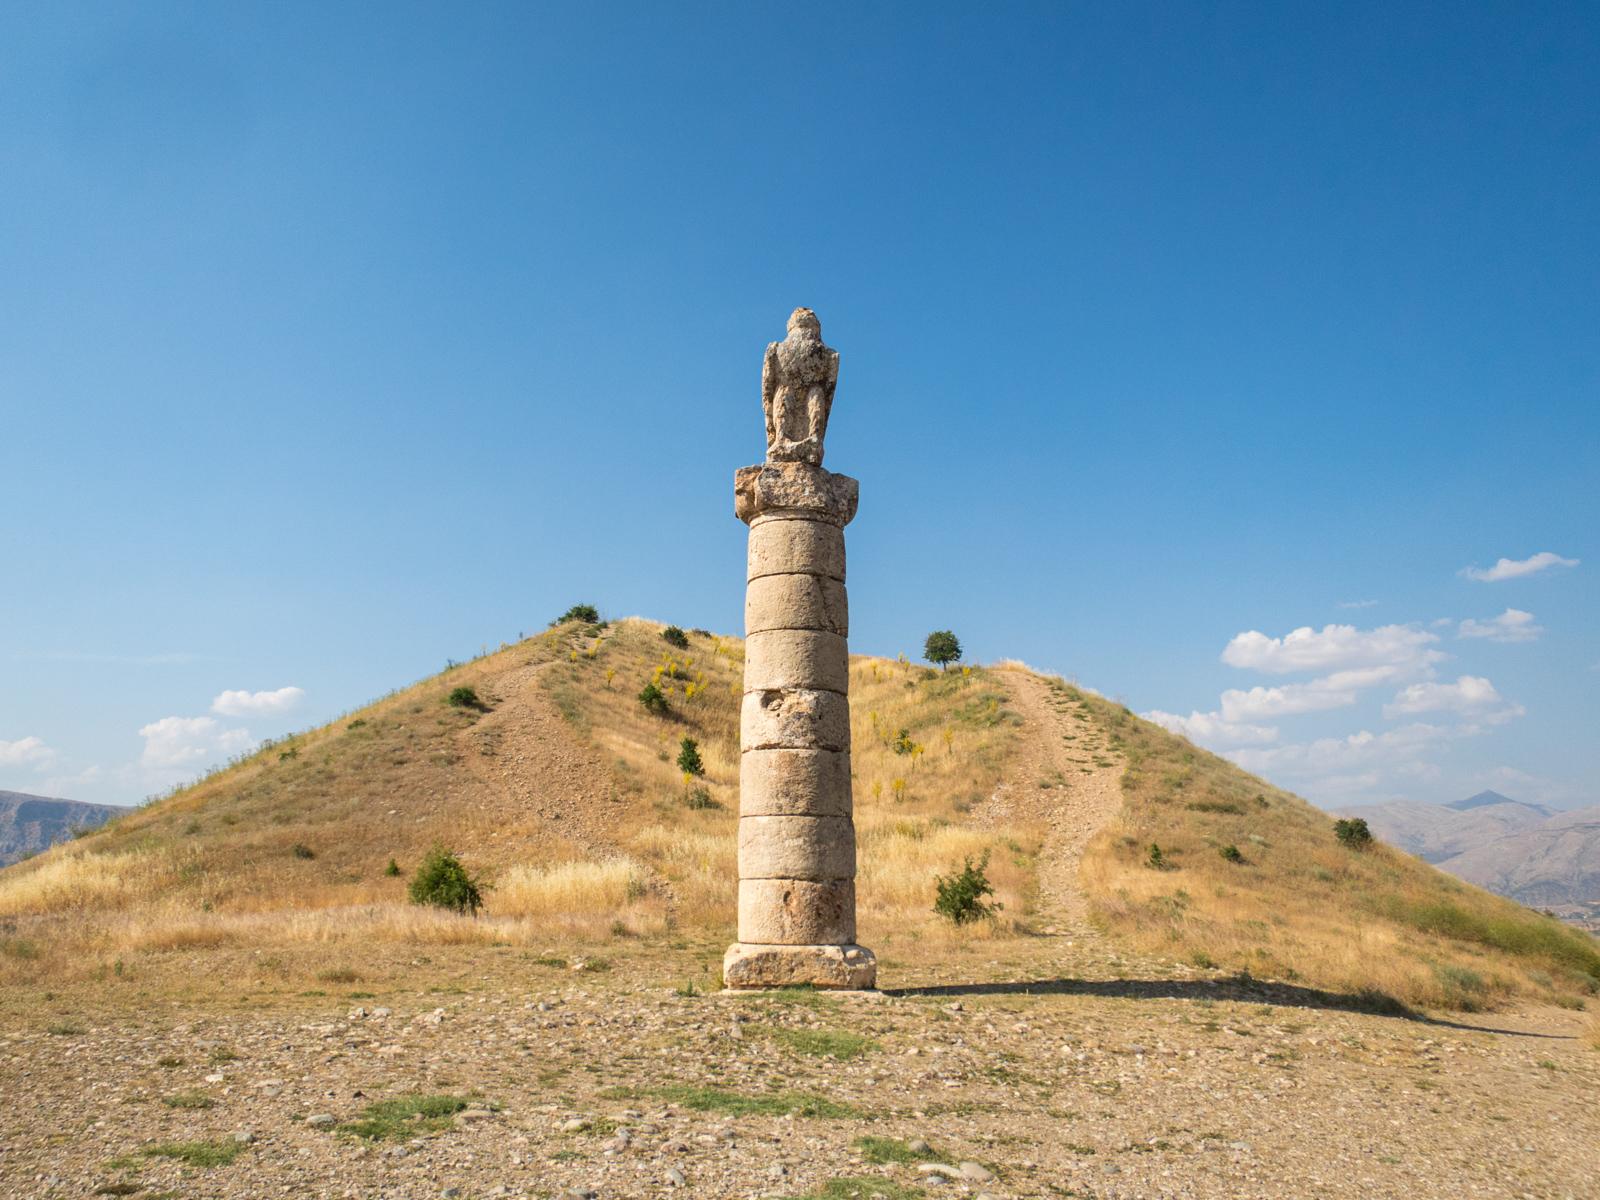 Karakus Tumulus with Doric column